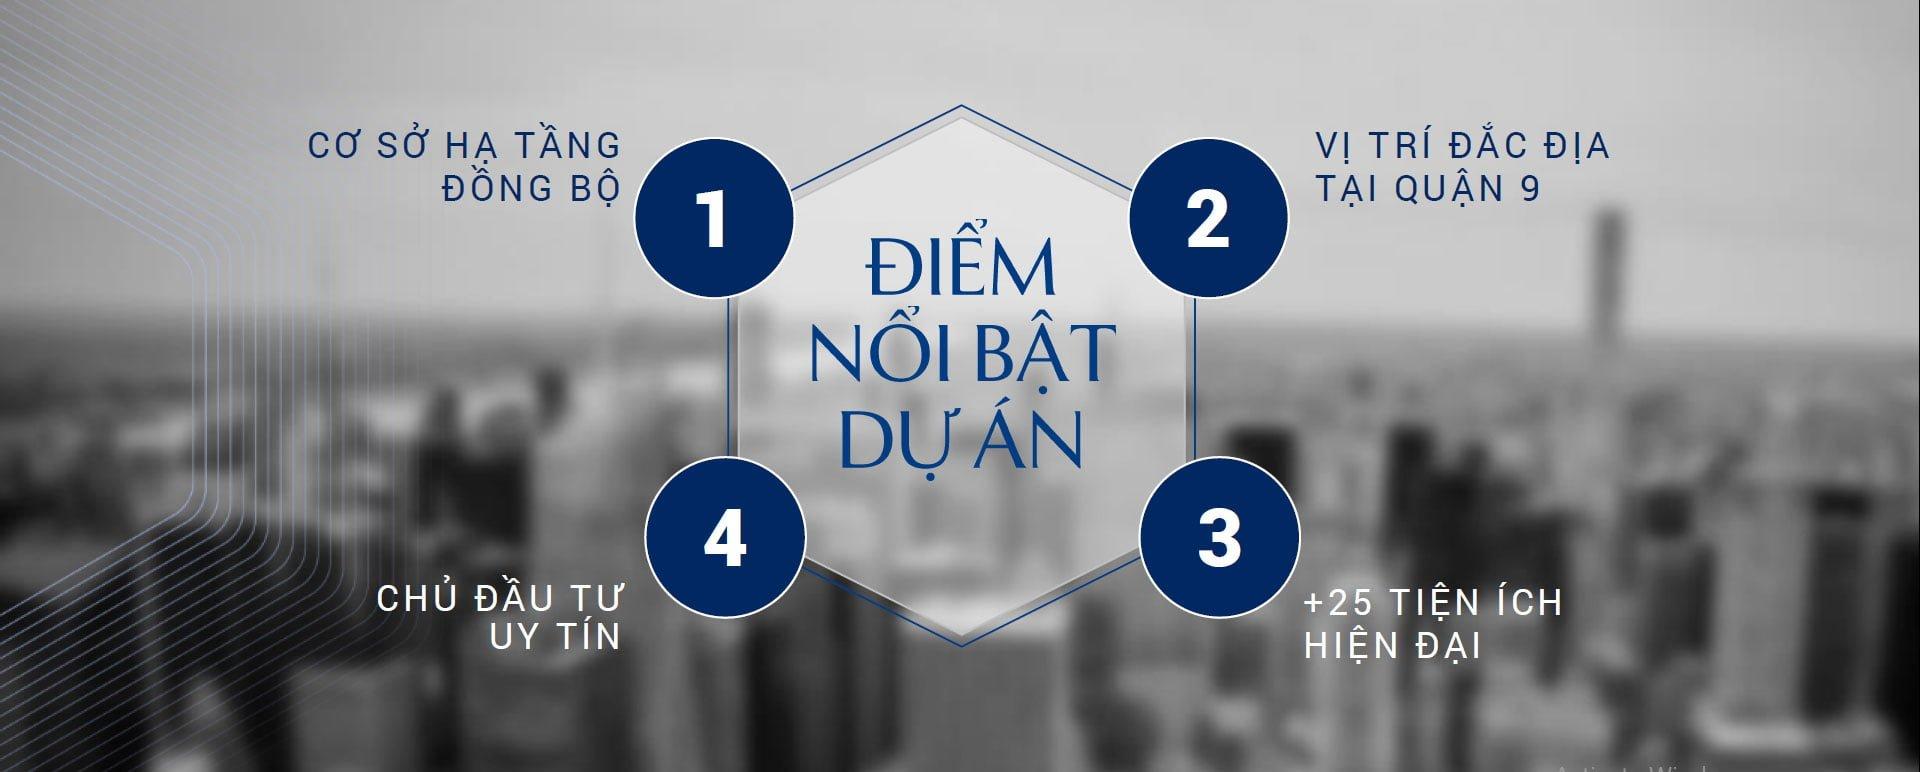 senturia q9 CENTRAL POINT diem no bat - DỰ ÁN BIỆT THỰ SENTURIA Q9 CENTRAL POINT QUẬN 9